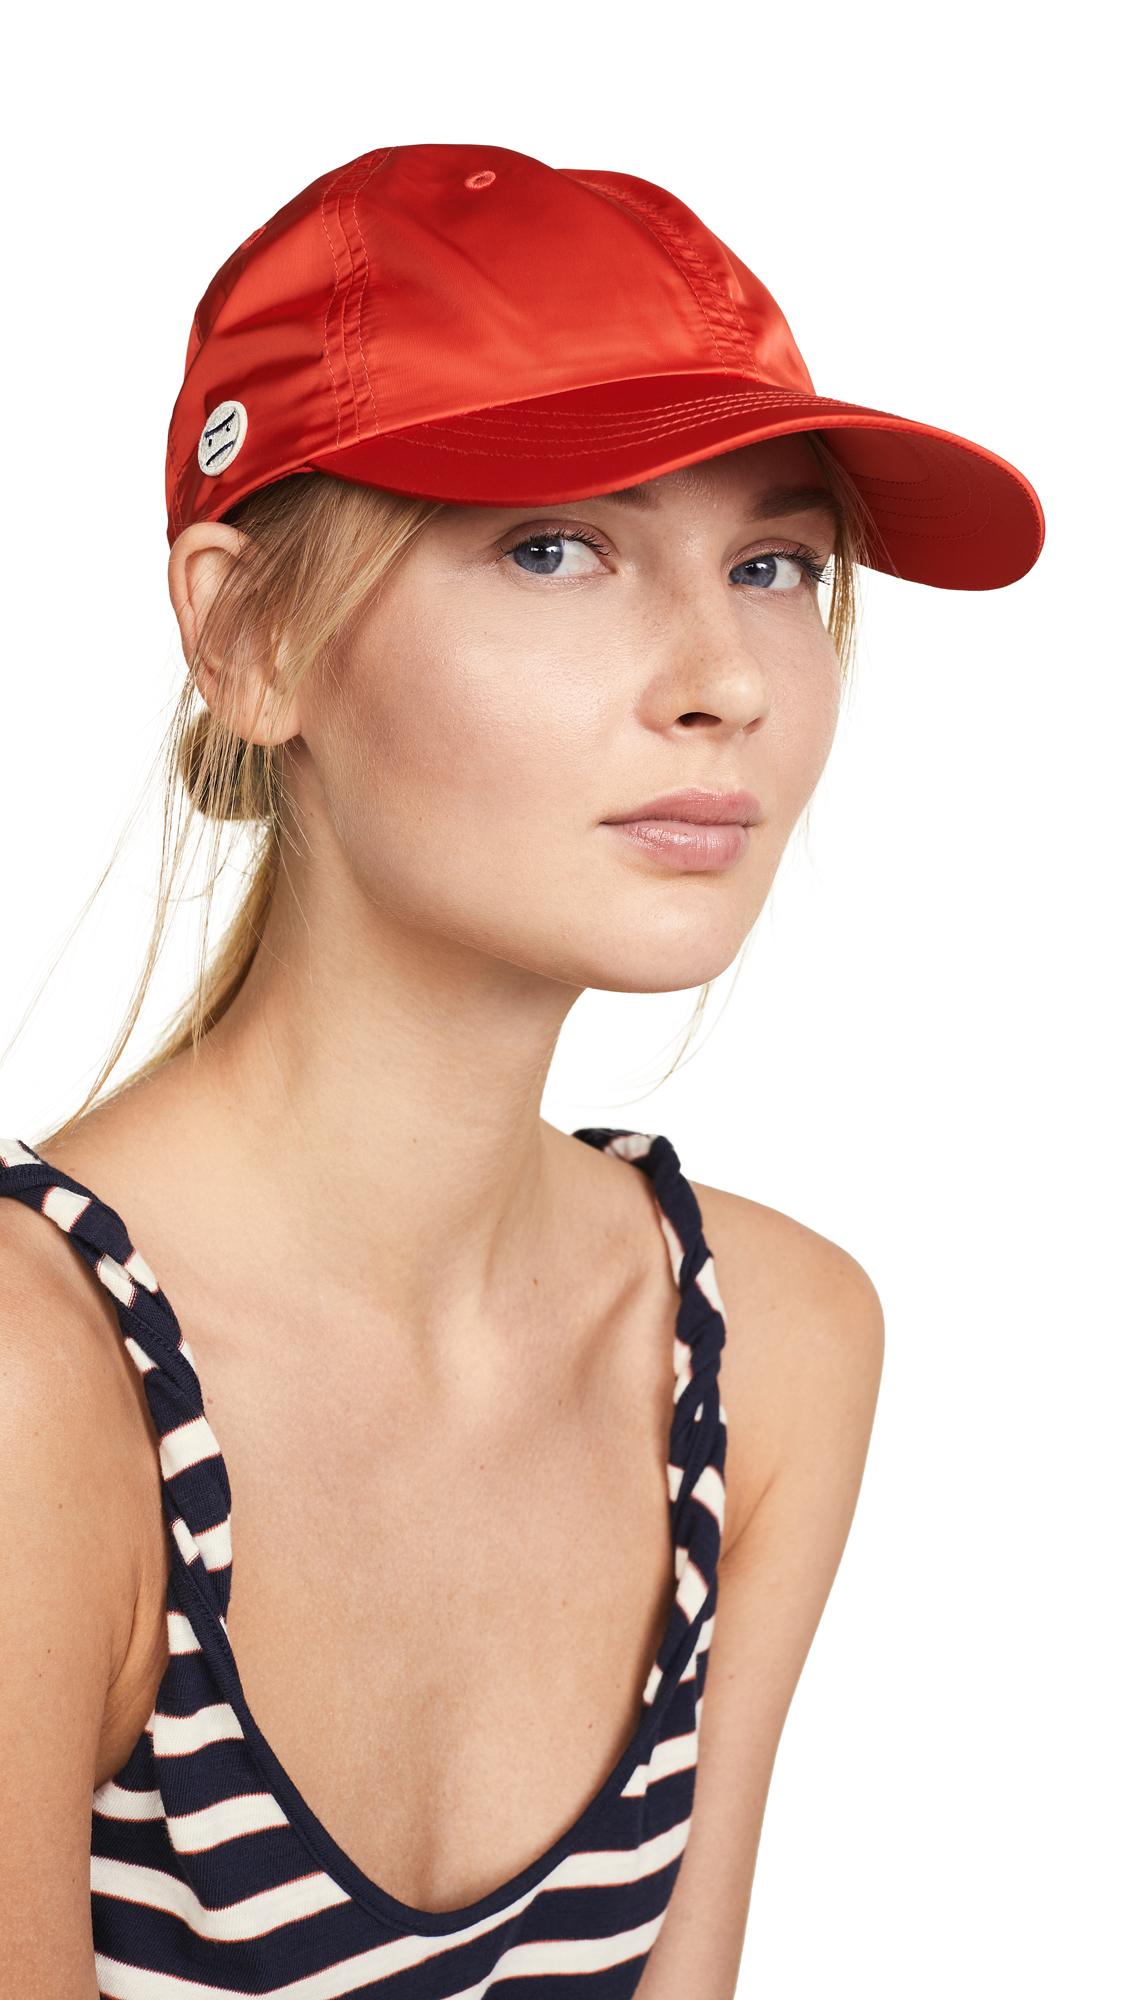 987476784 Buy tory burch hats for women - Best women's tory burch hats shop ...